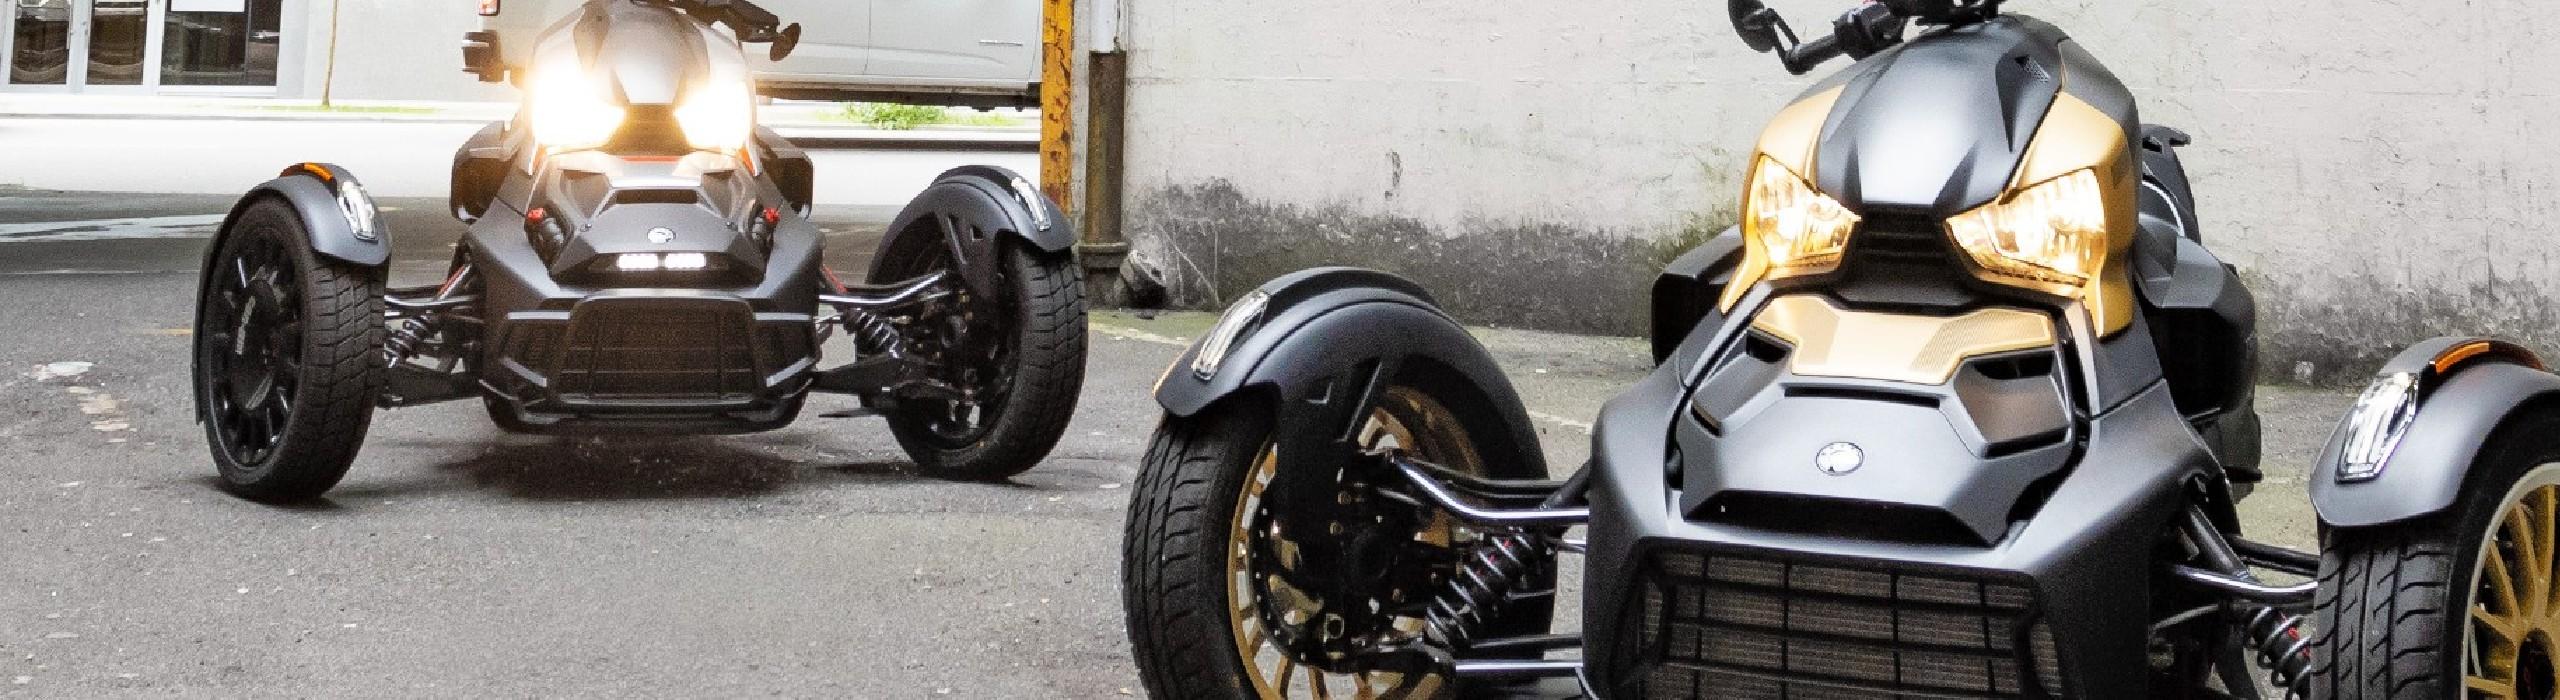 Can-Am RYKER EDITION RALLY - Moto 3 roues 2021 - Sas Chossade Busato Motoneiges et Quads (73 et 74)